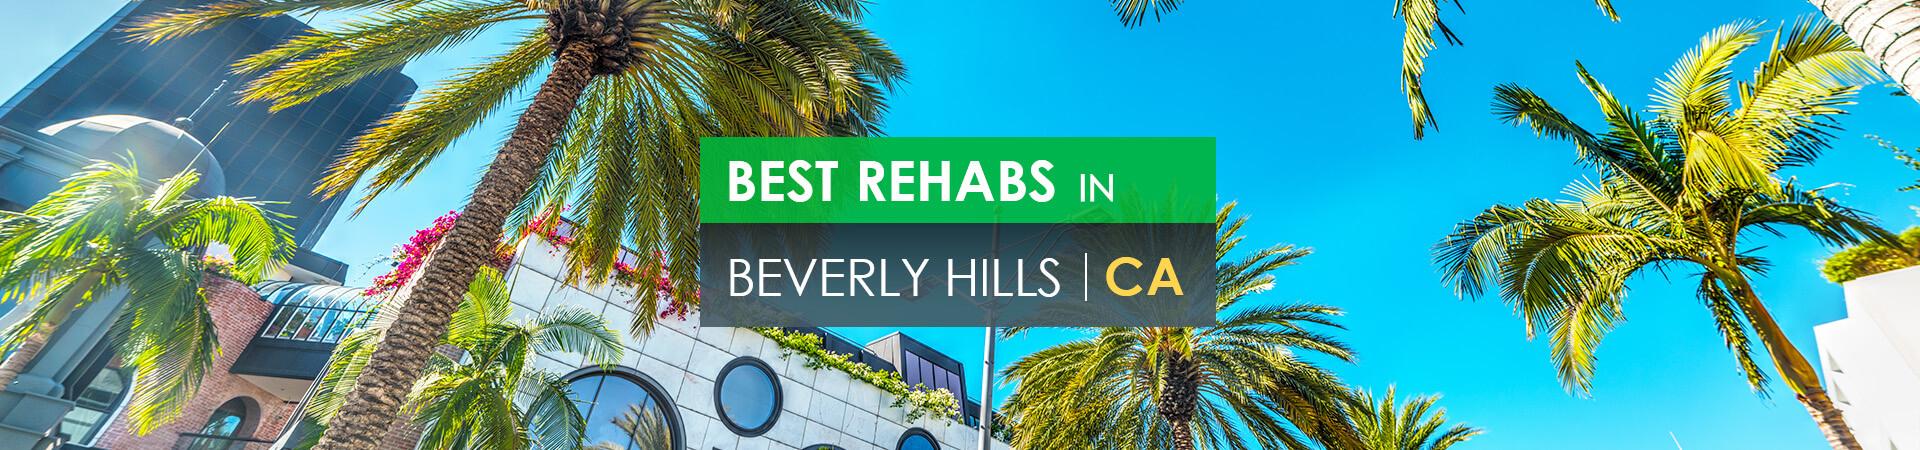 Best rehabs in Beverly Hills, CA